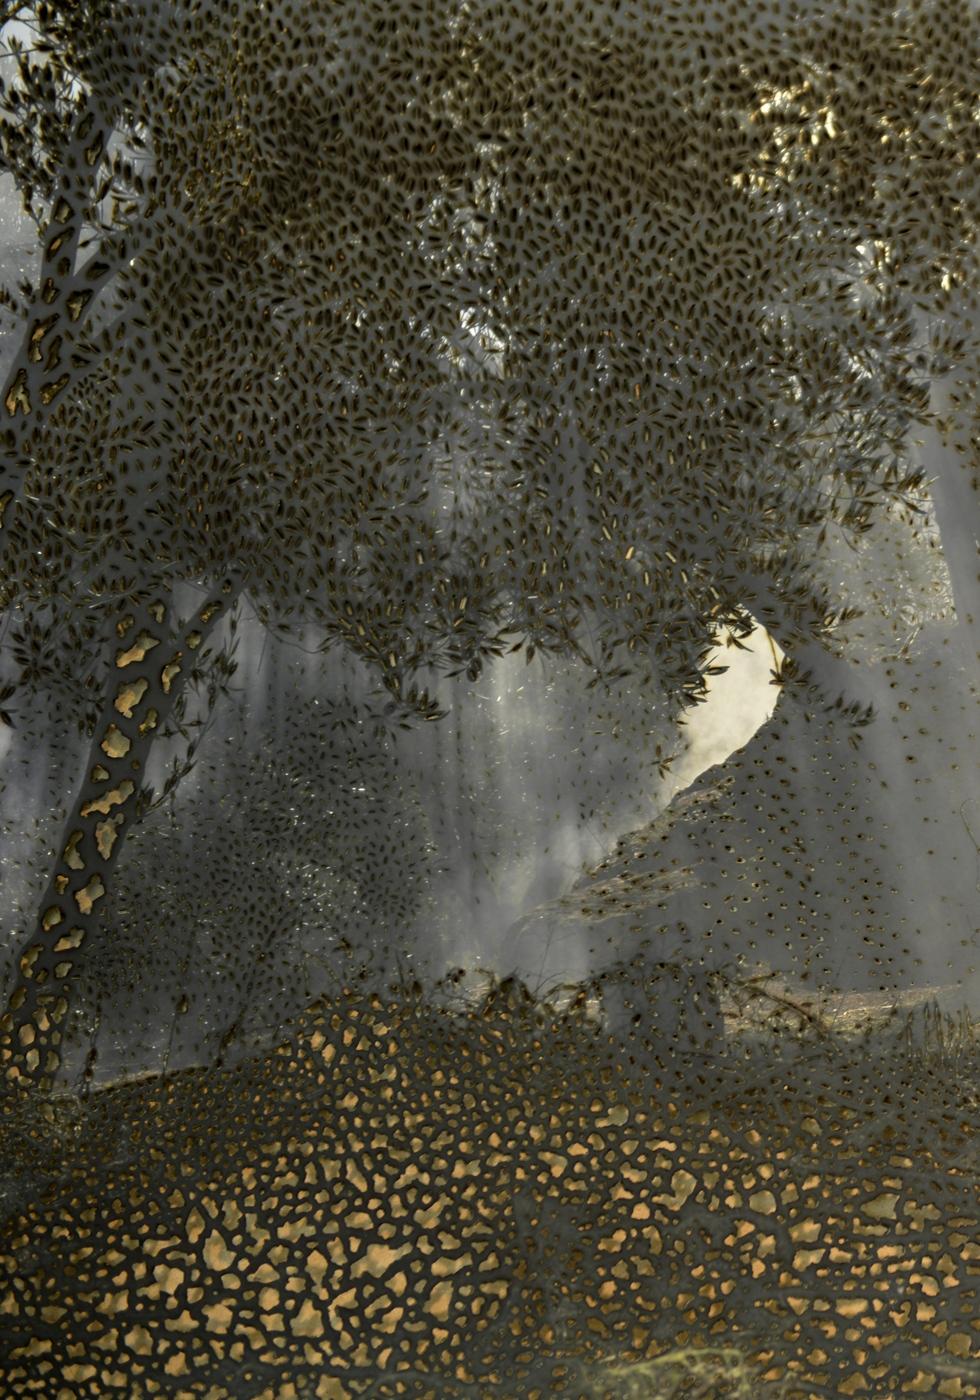 The Aura, @ 2019, Fine Art print on Hanemühle paper with burns, 110 x 160 cm